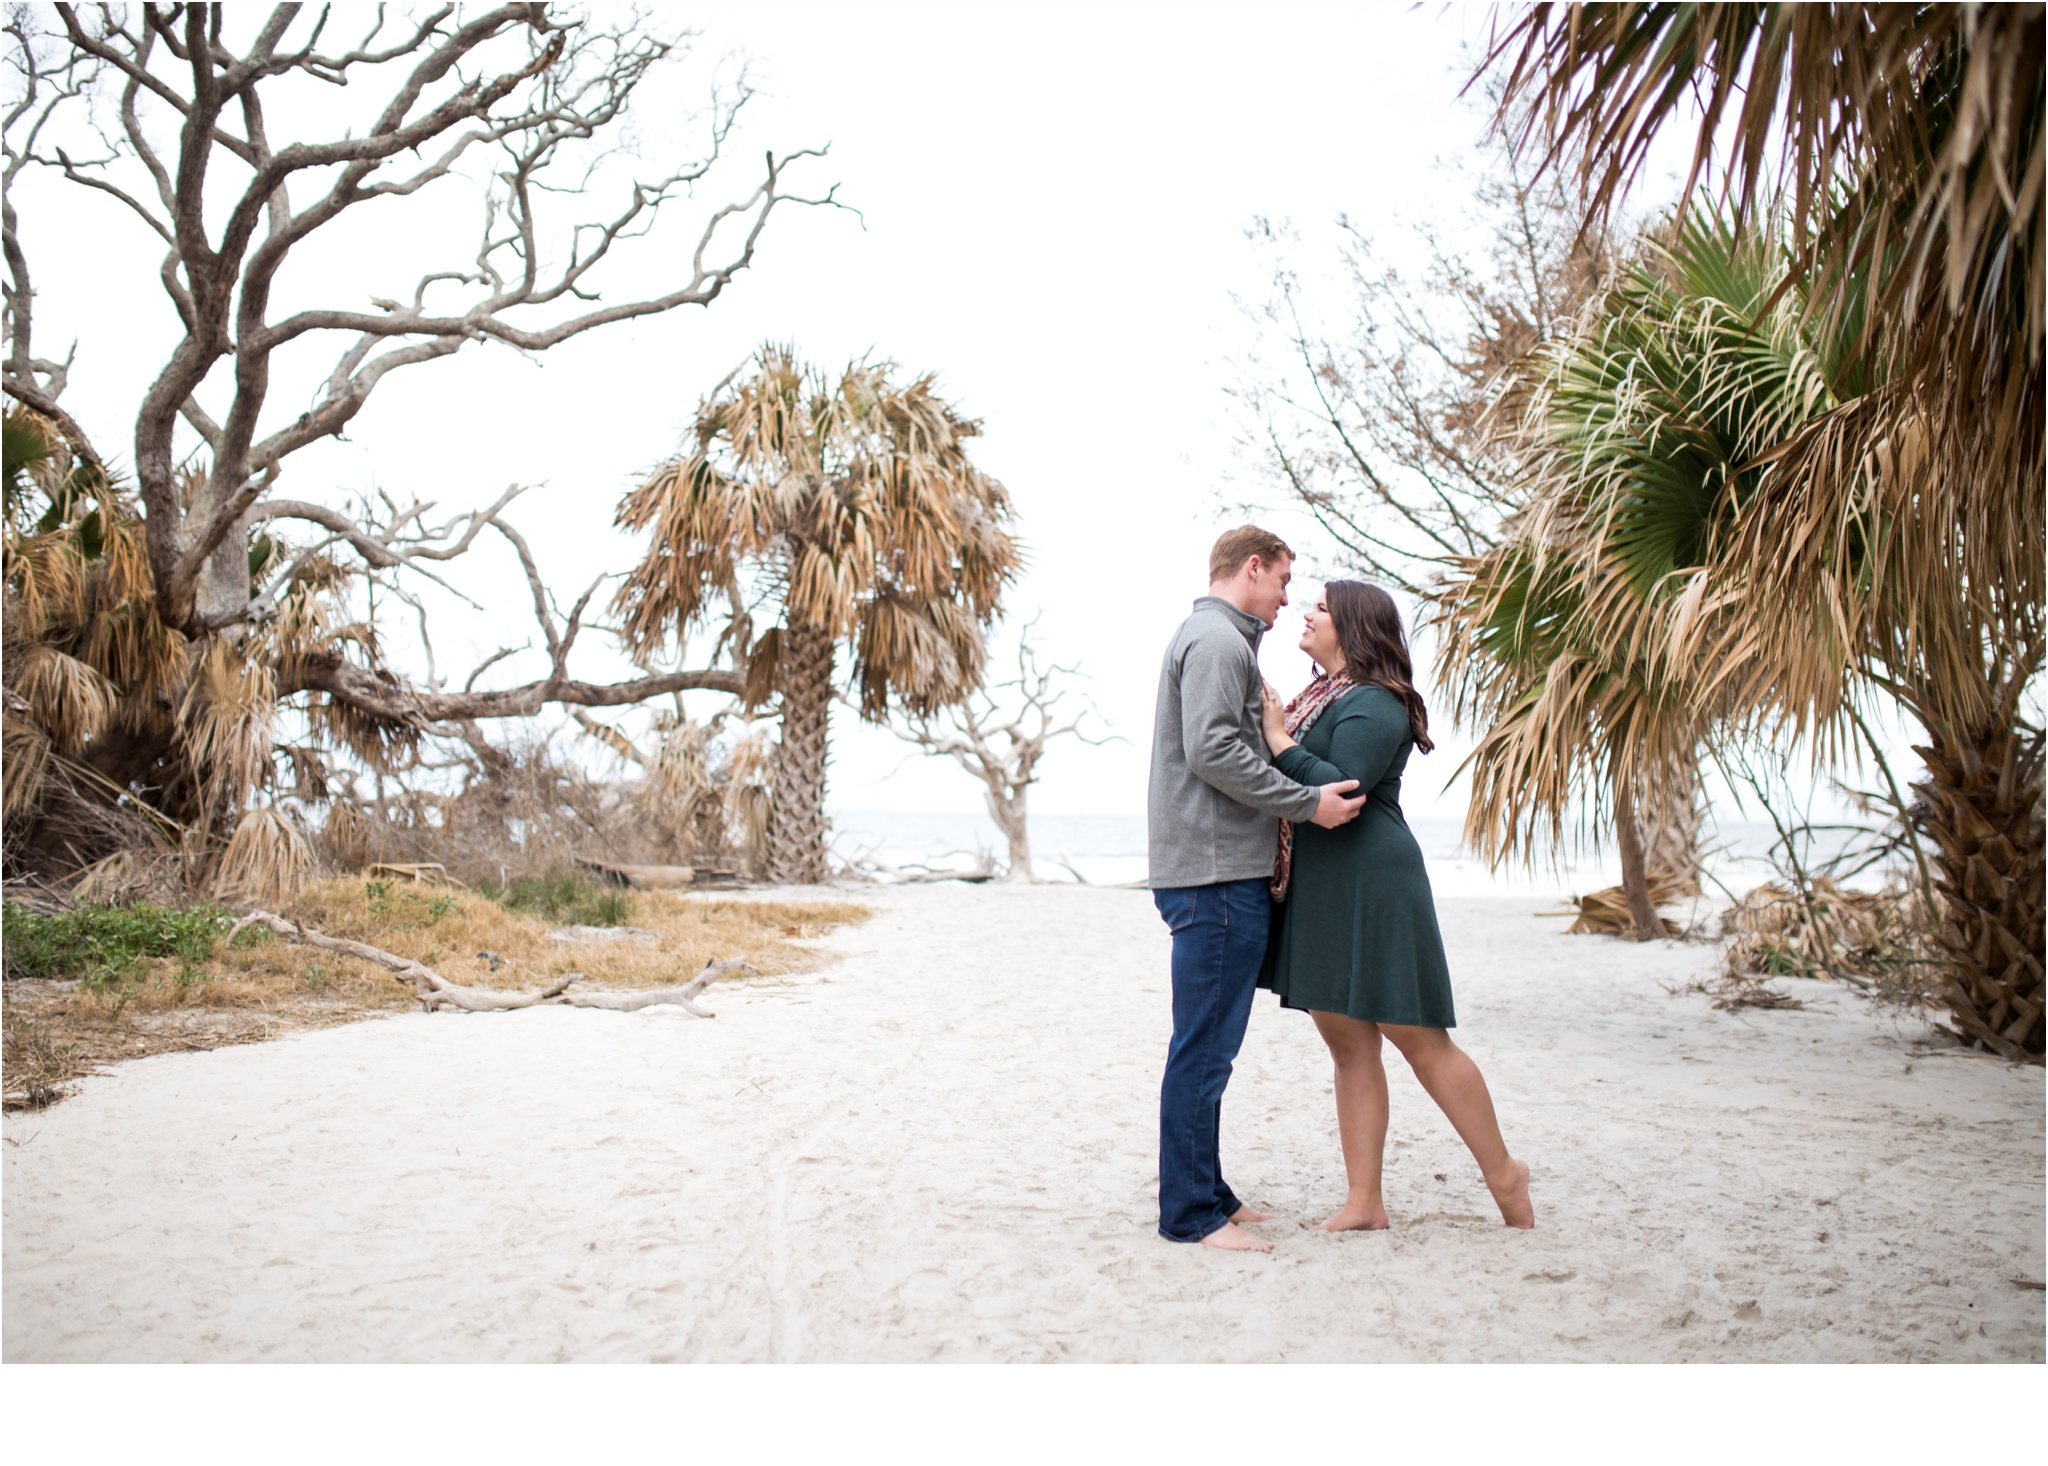 Rainey_Gregg_Photography_St._Simons_Island_Georgia_California_Wedding_Portrait_Photography_0585.jpg